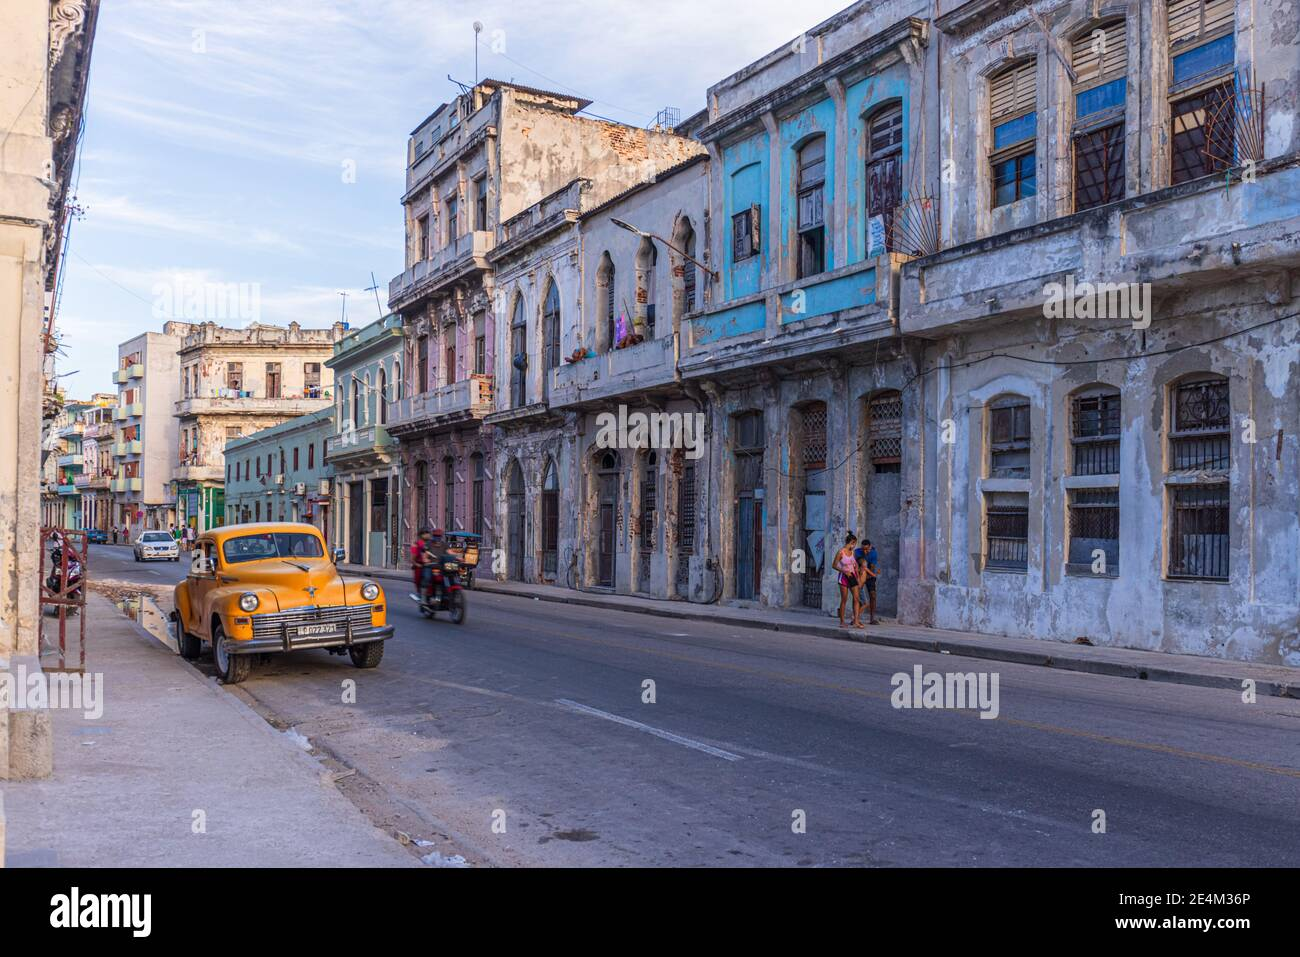 Havana, Cuba - January 11, 2021: Empty streets in old Havana, Cuba. Daily life in Havana Vieja has changed due to the global Corona pandemic. Stock Photo